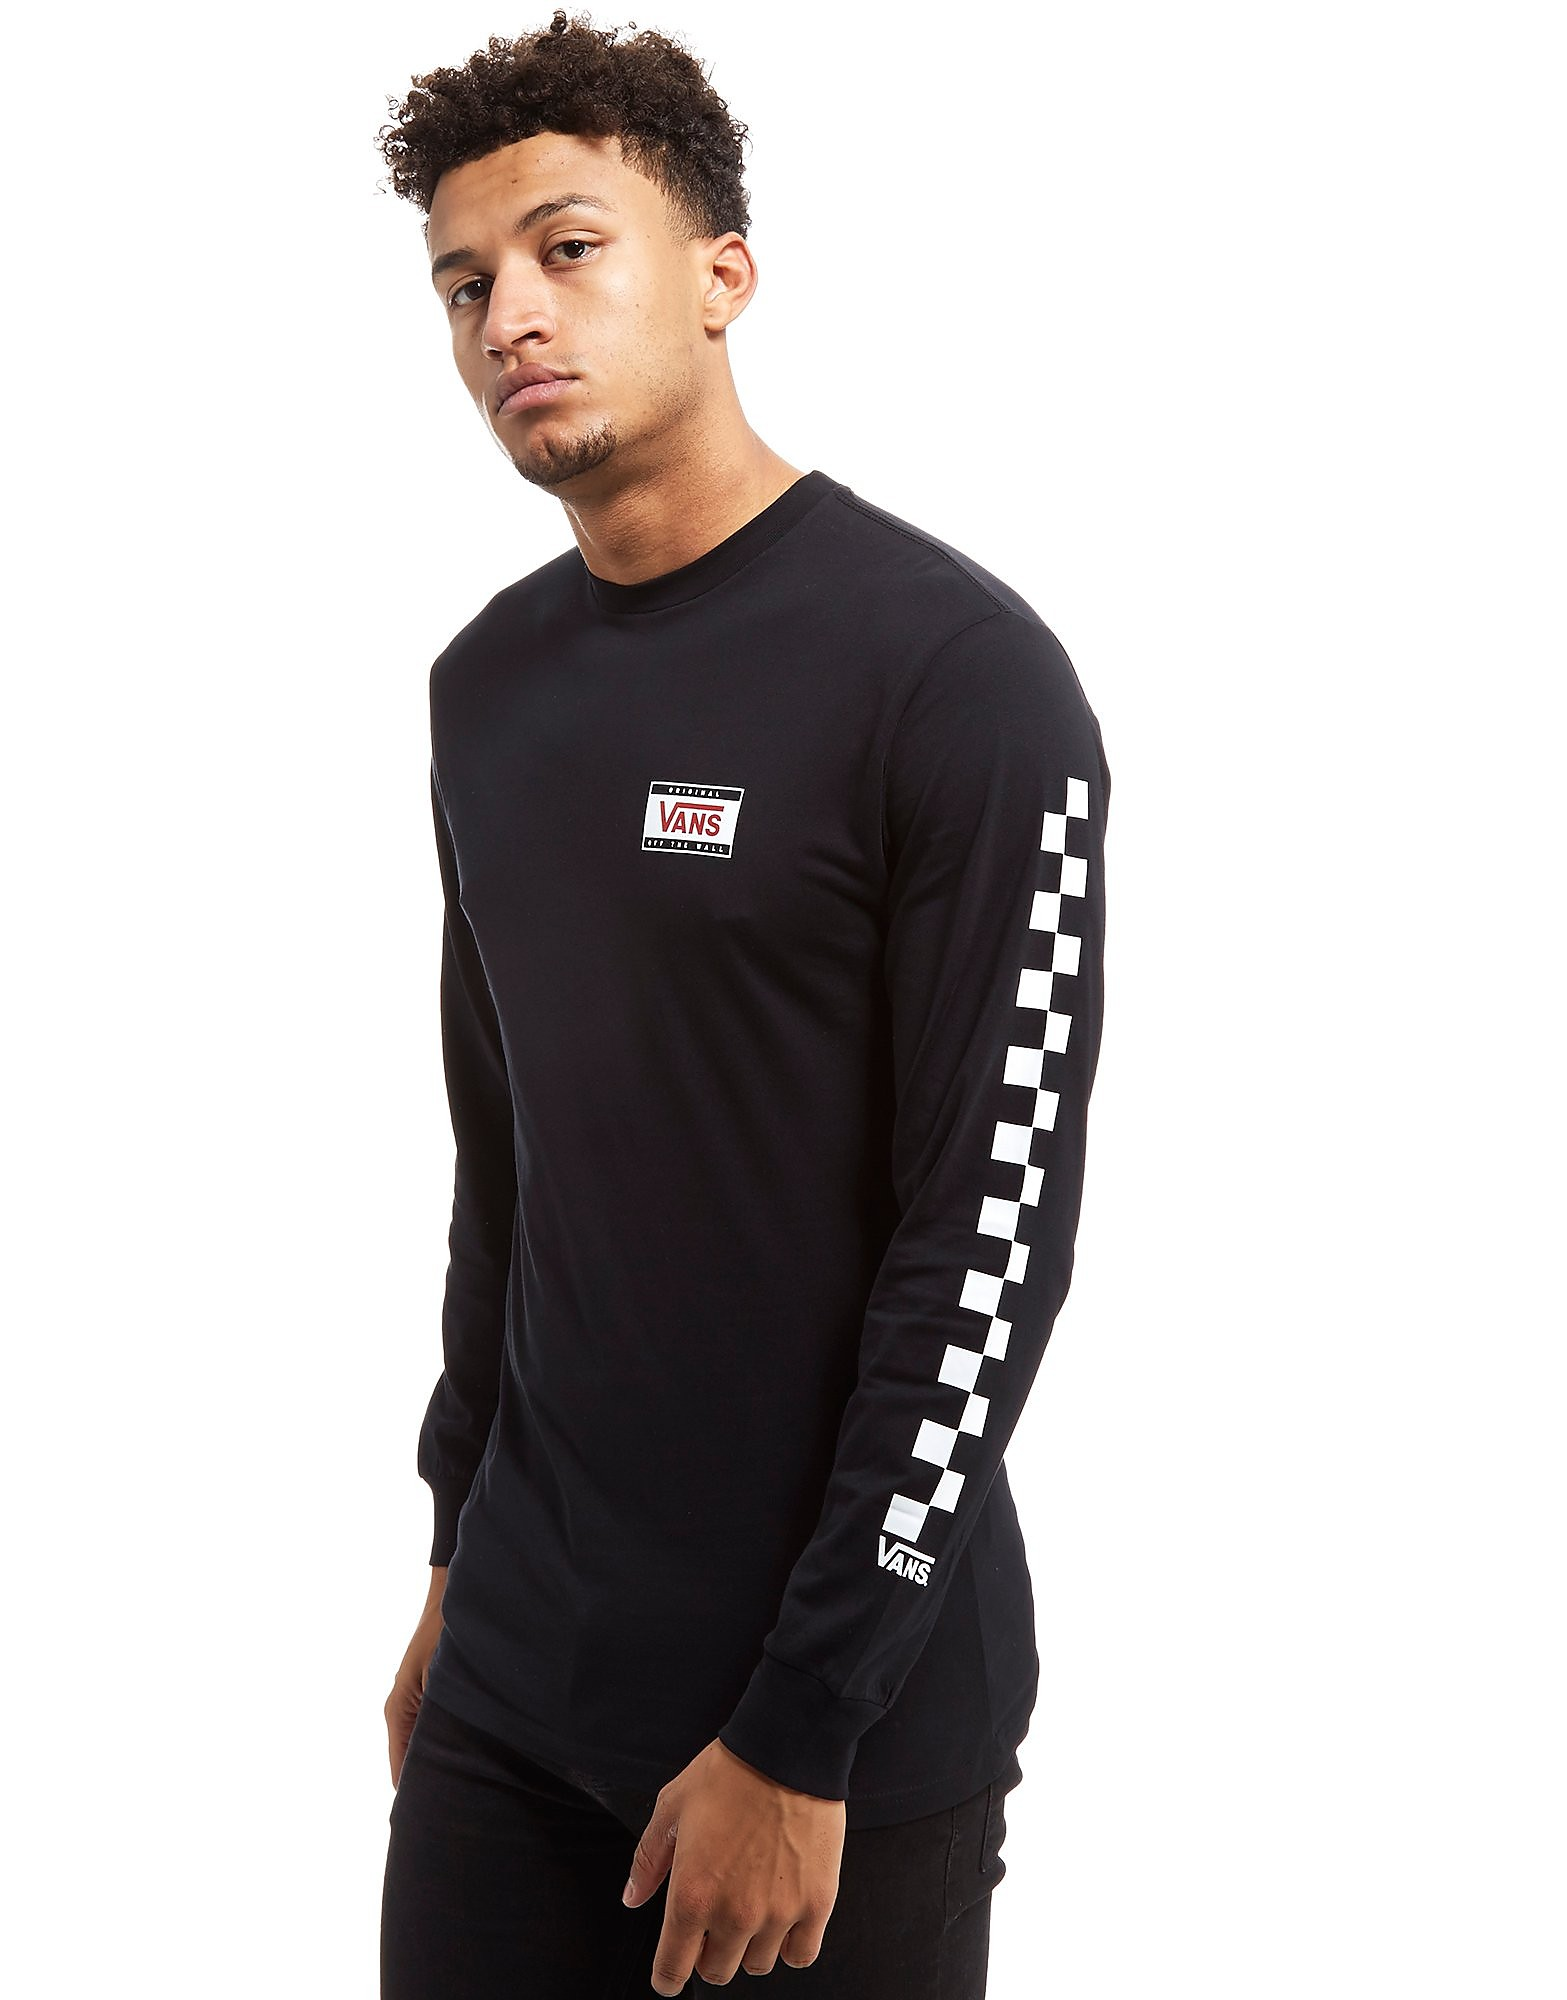 Vans Checkerboard T-Shirt